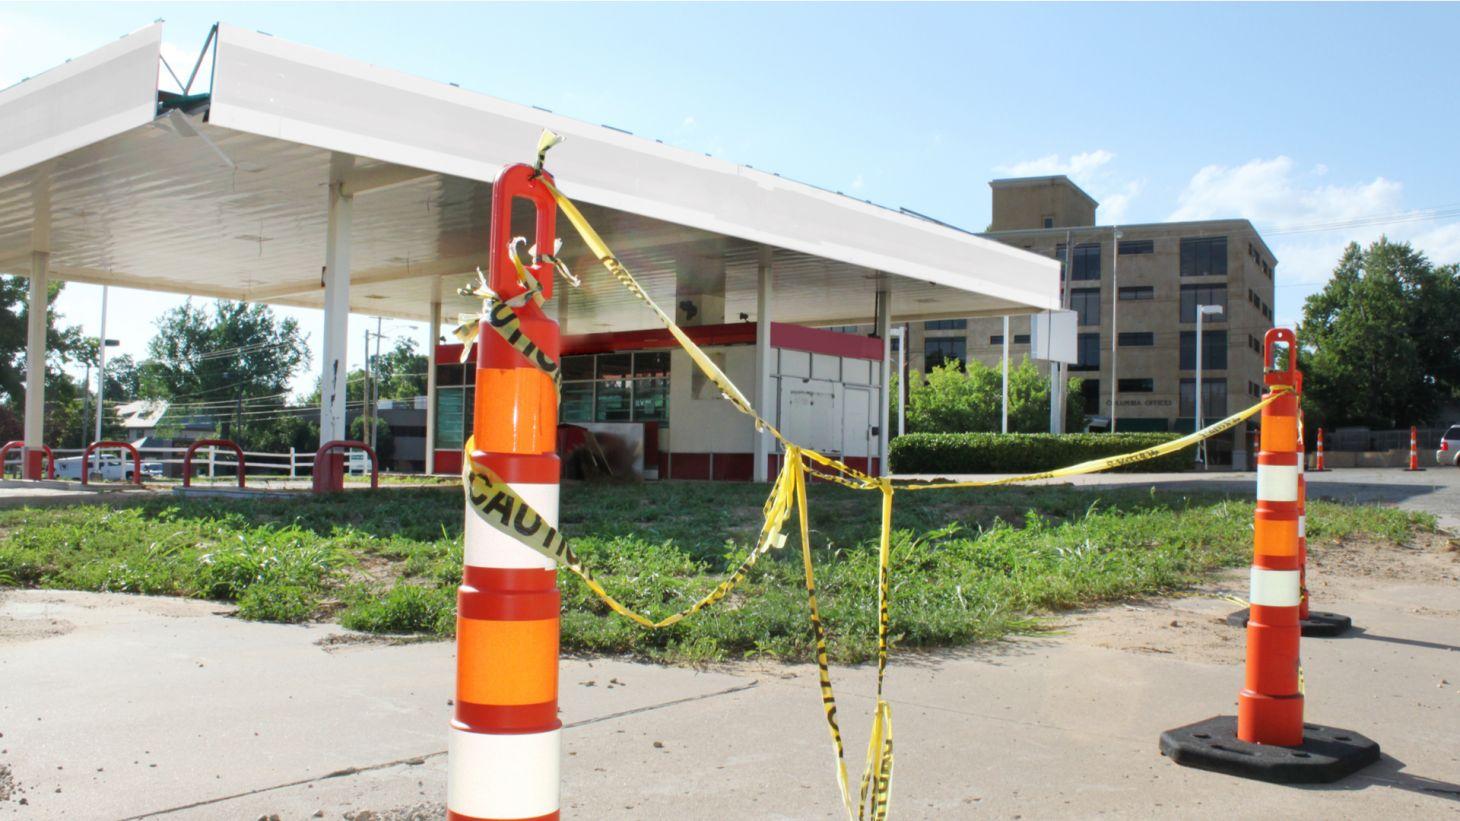 posto de combustivel fechado interditado anp